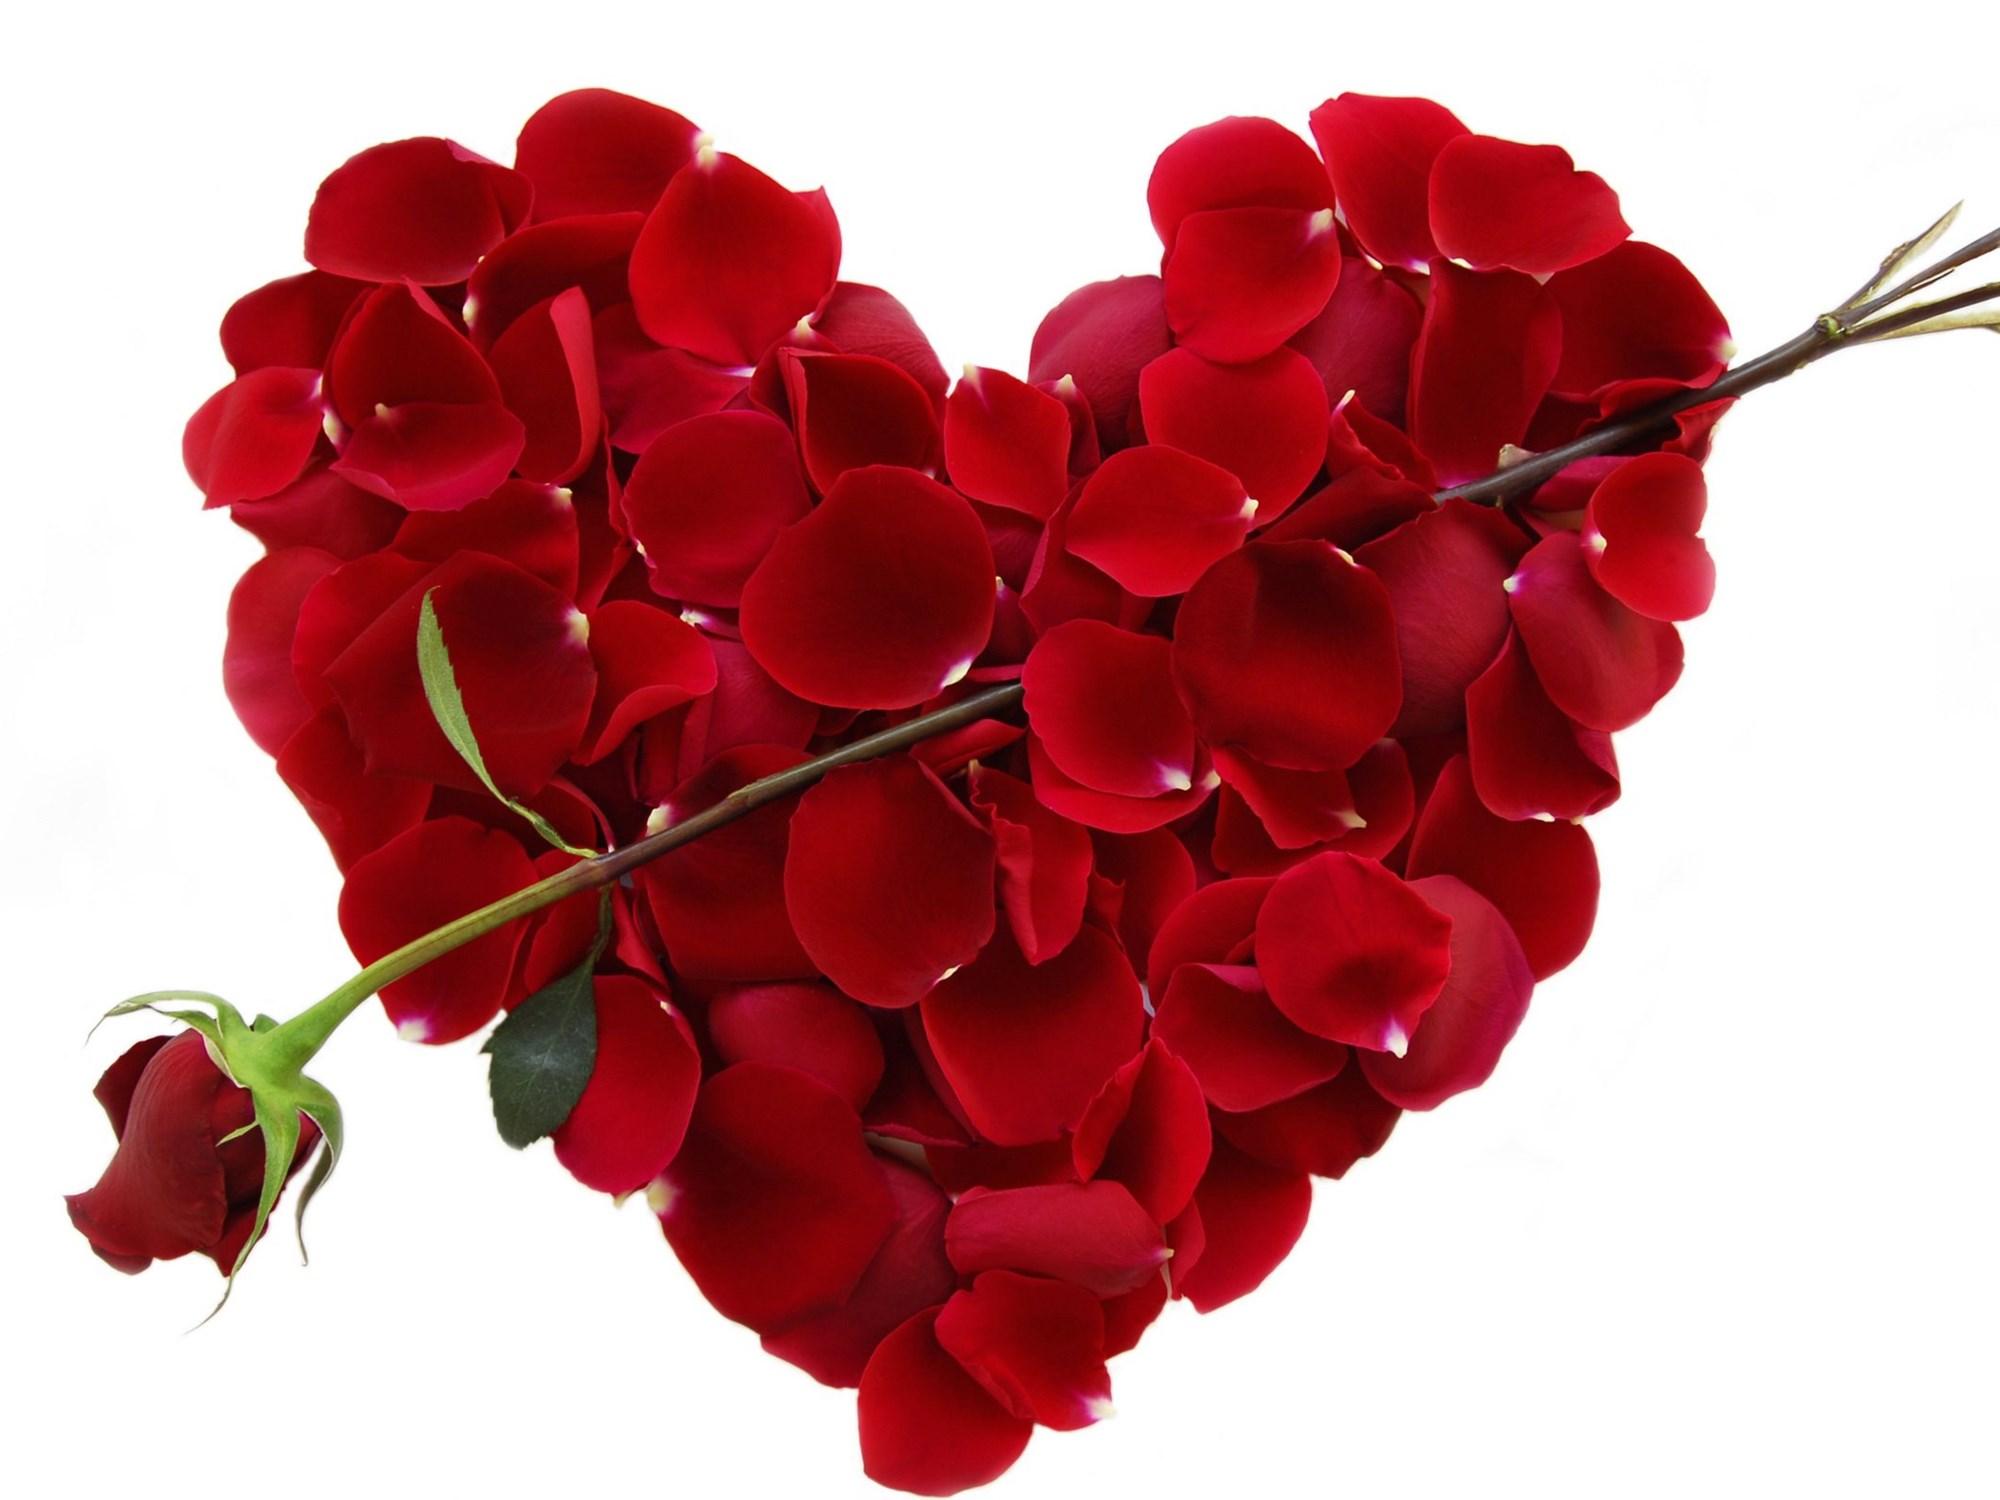 heart wallpapers hd free download hd beautiful desktop wallpapers